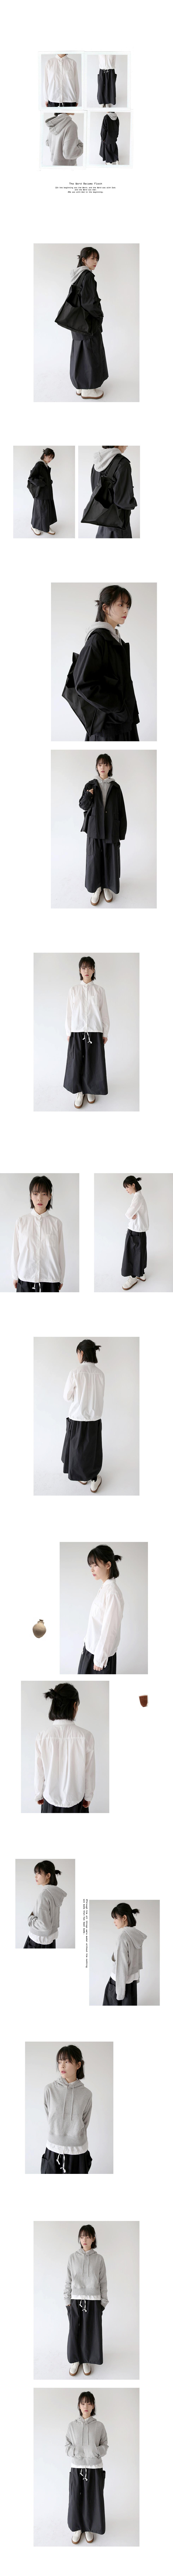 string point regular shirts